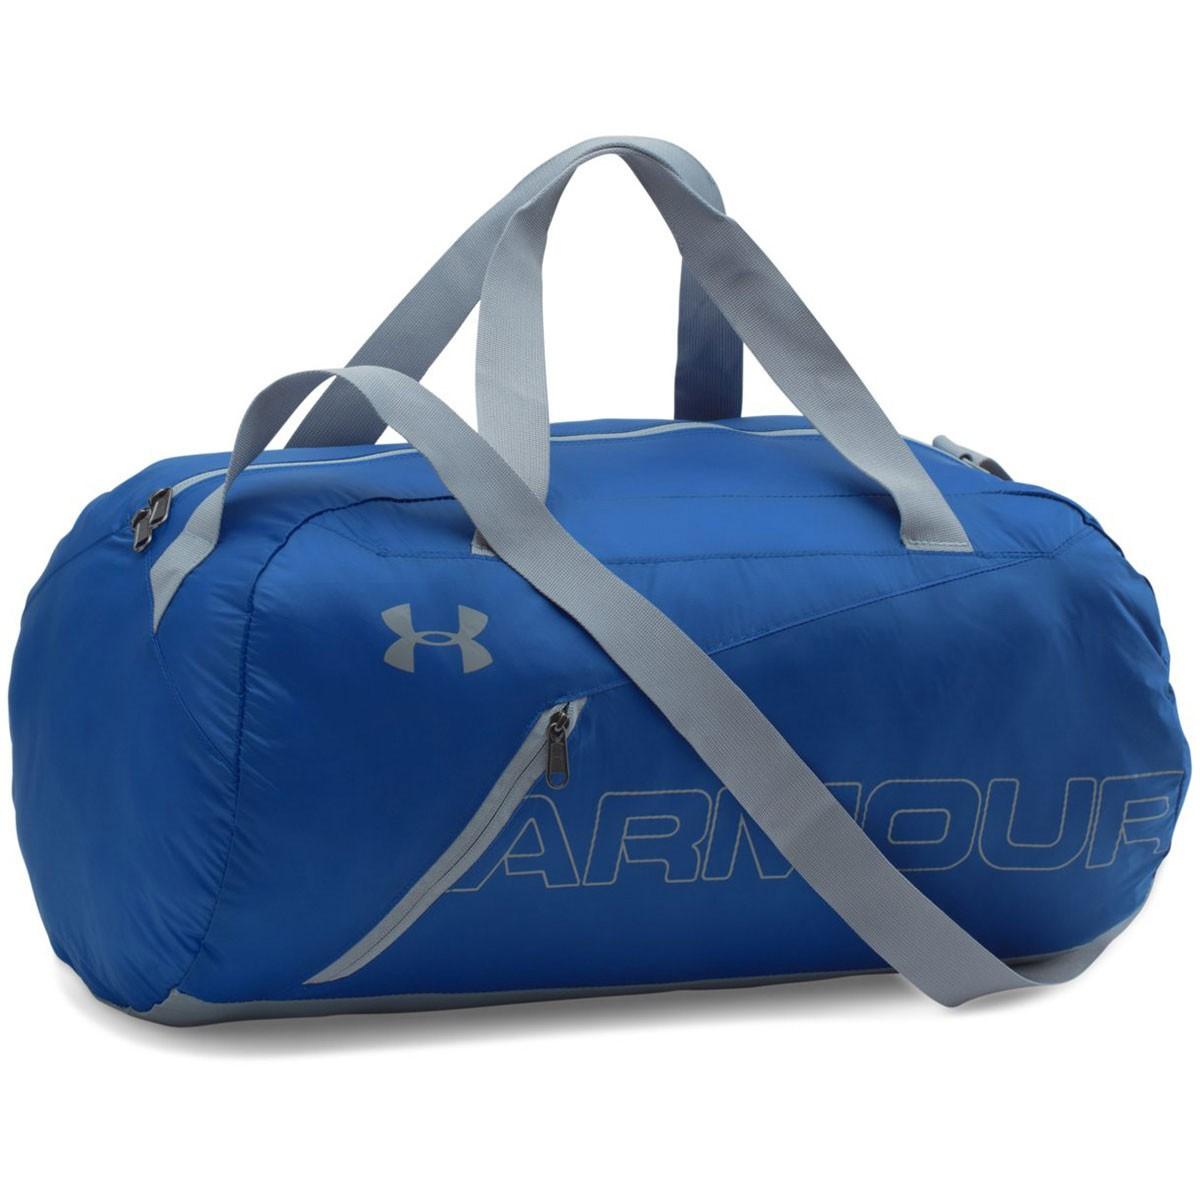 Under Armour 2016 UA Adaptable Packable Duffel Bag - Bags ... 2903ab31fb7ac